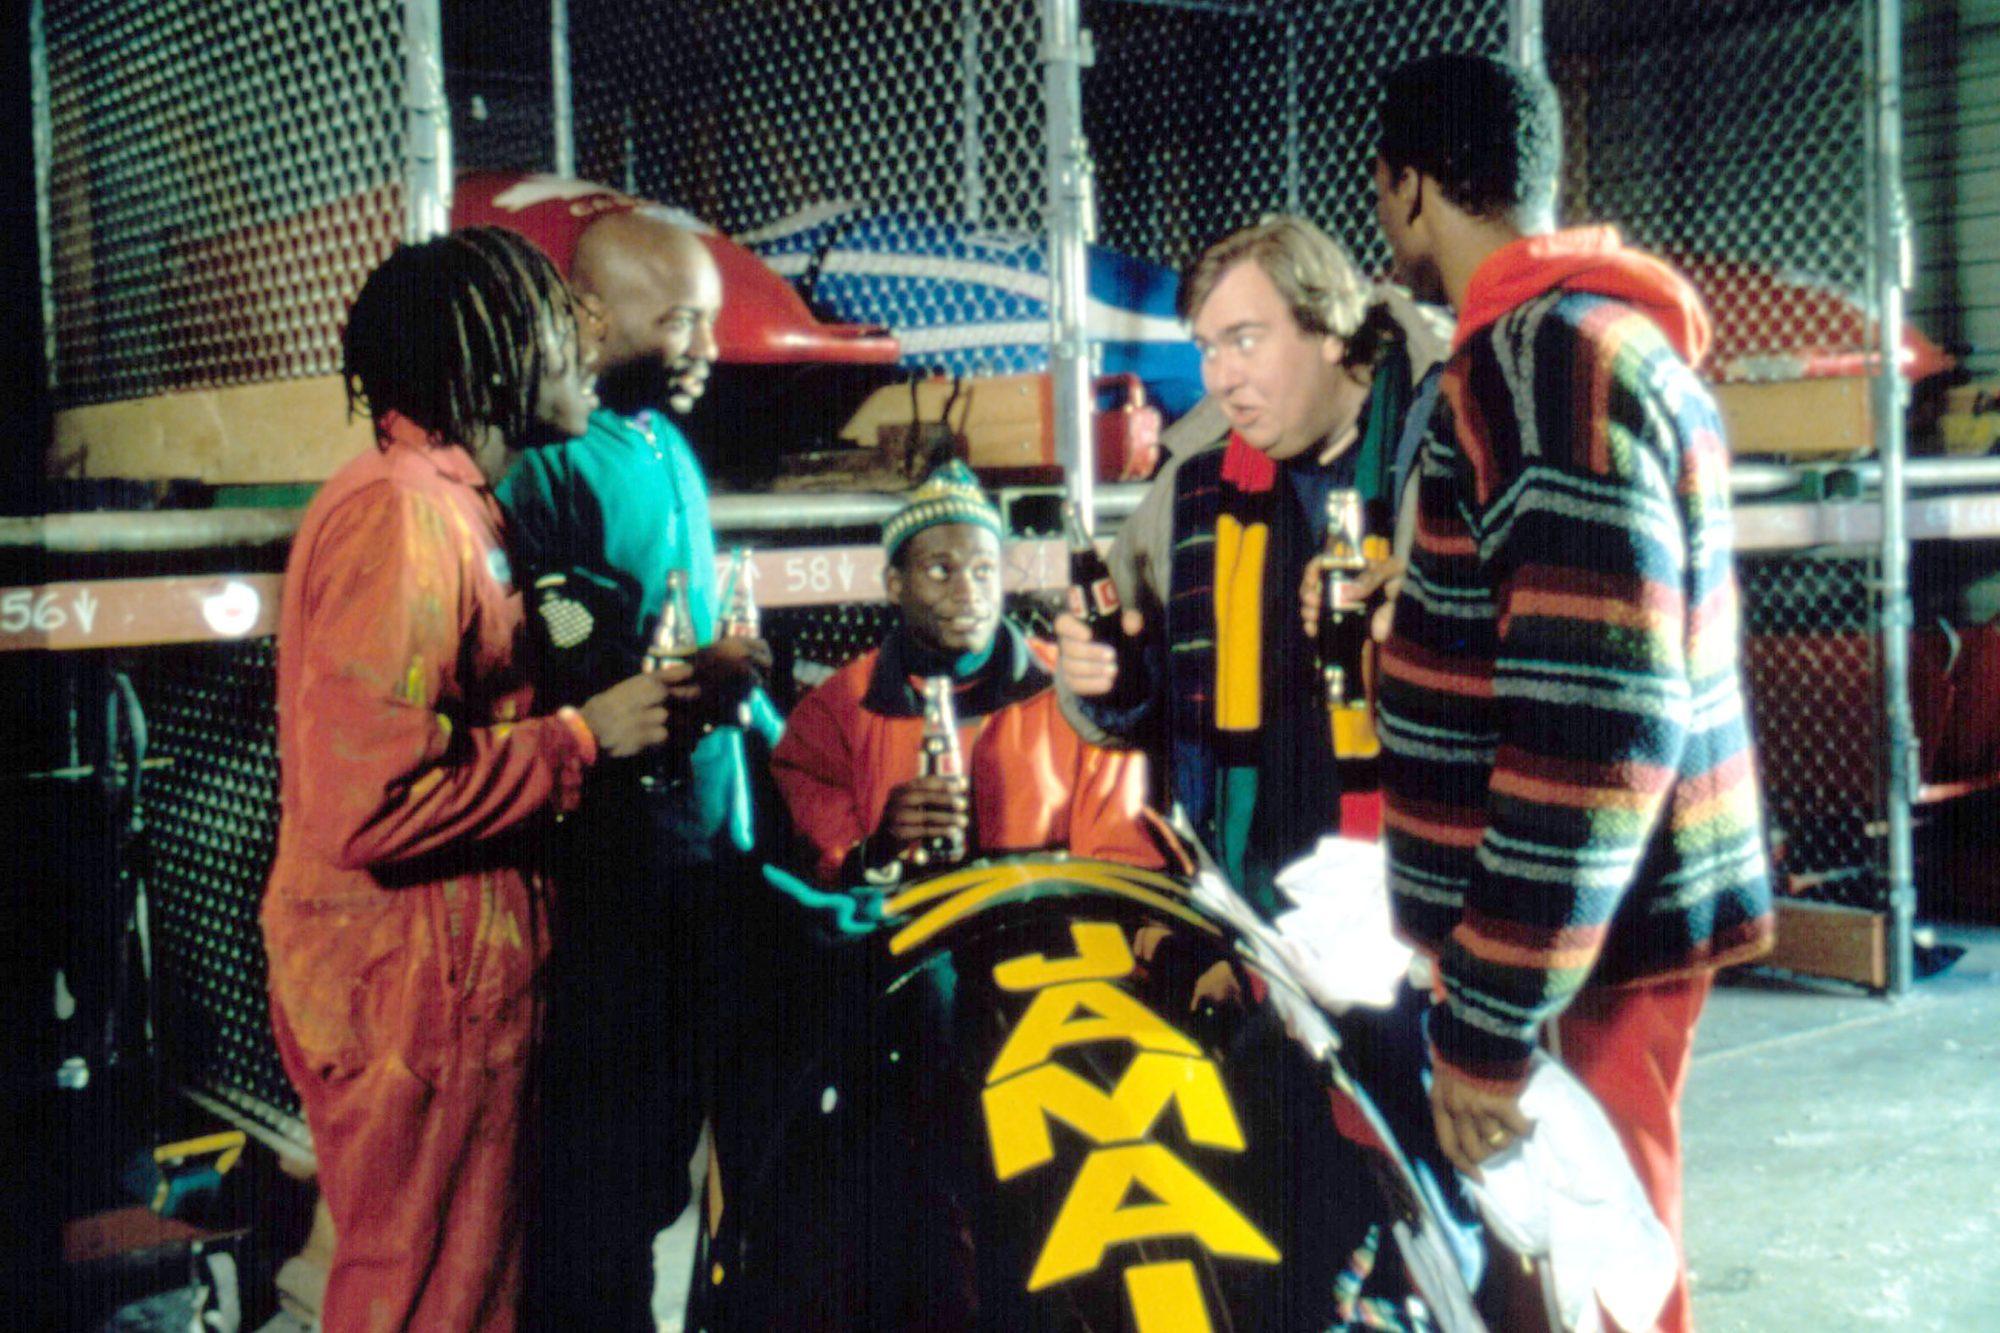 COOL RUNNINGS, Doug E. Doug, Malik Yoba, Rawle D. Lewis, John Candy, Leon, 1993